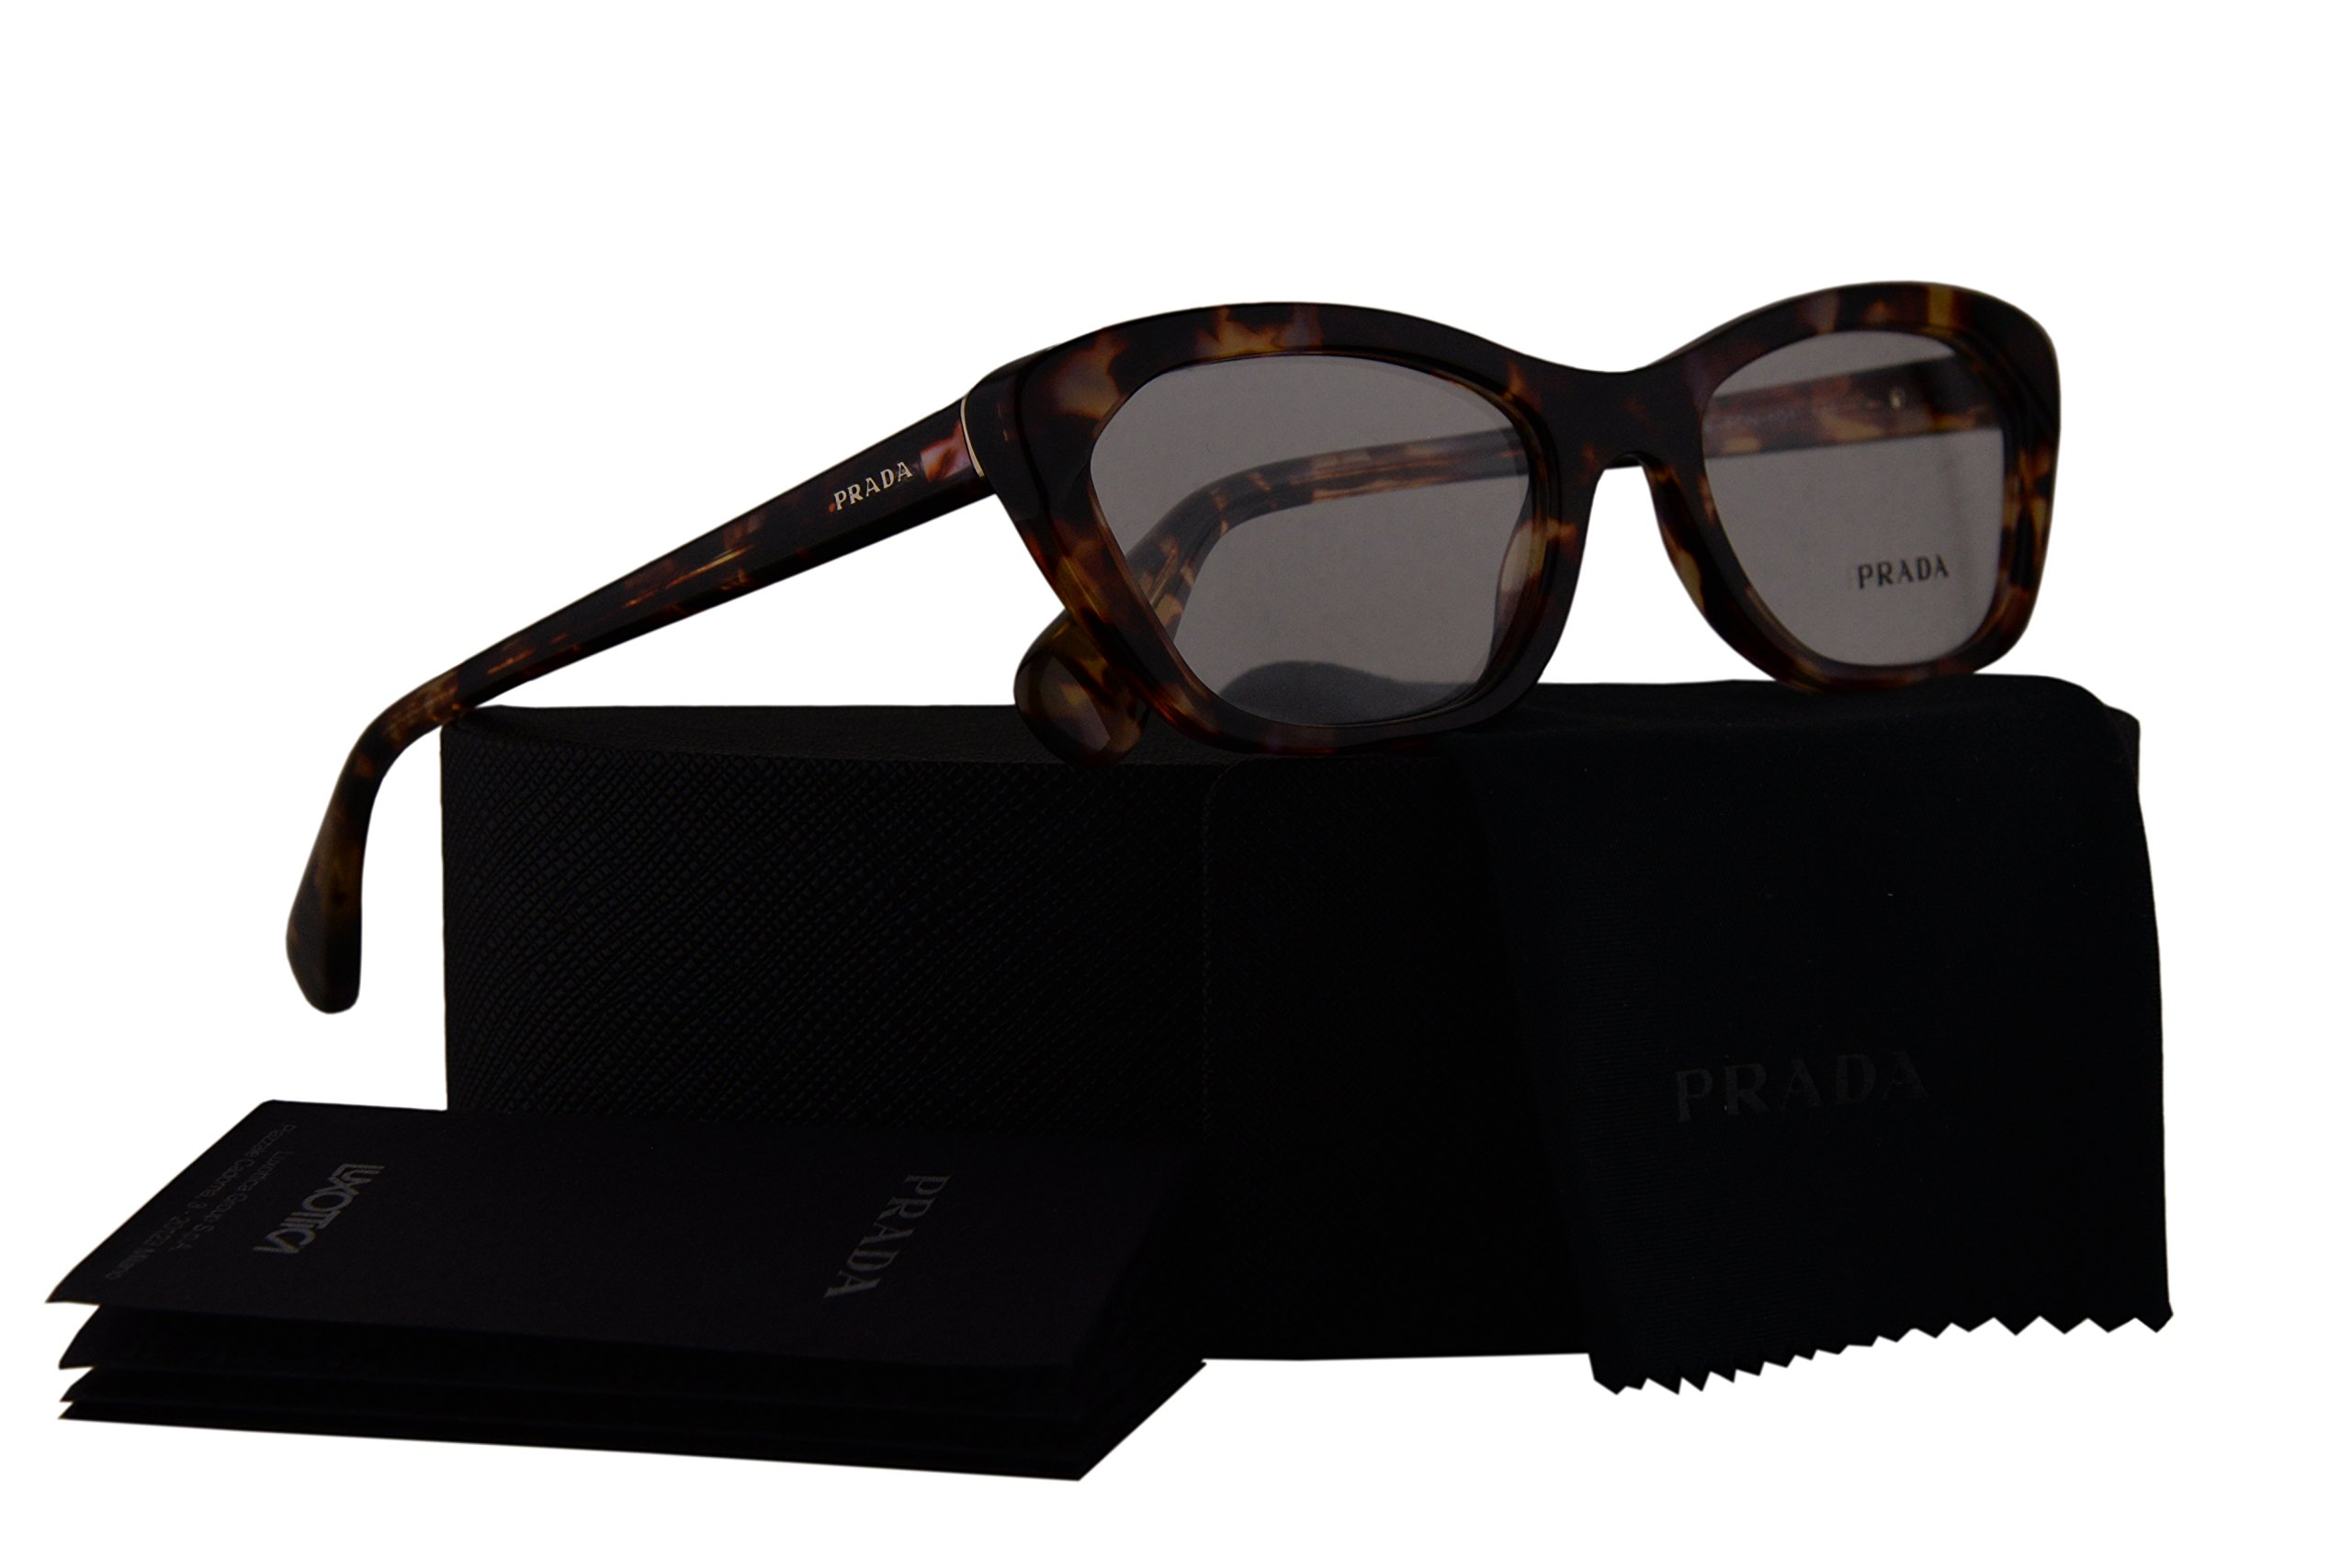 Prada PR03QV Eyeglasses 52-18-140 Spotted Havana Pink w/Demo Clear Lens PDN1O1 VPR03Q VPR 03Q PR 03QV